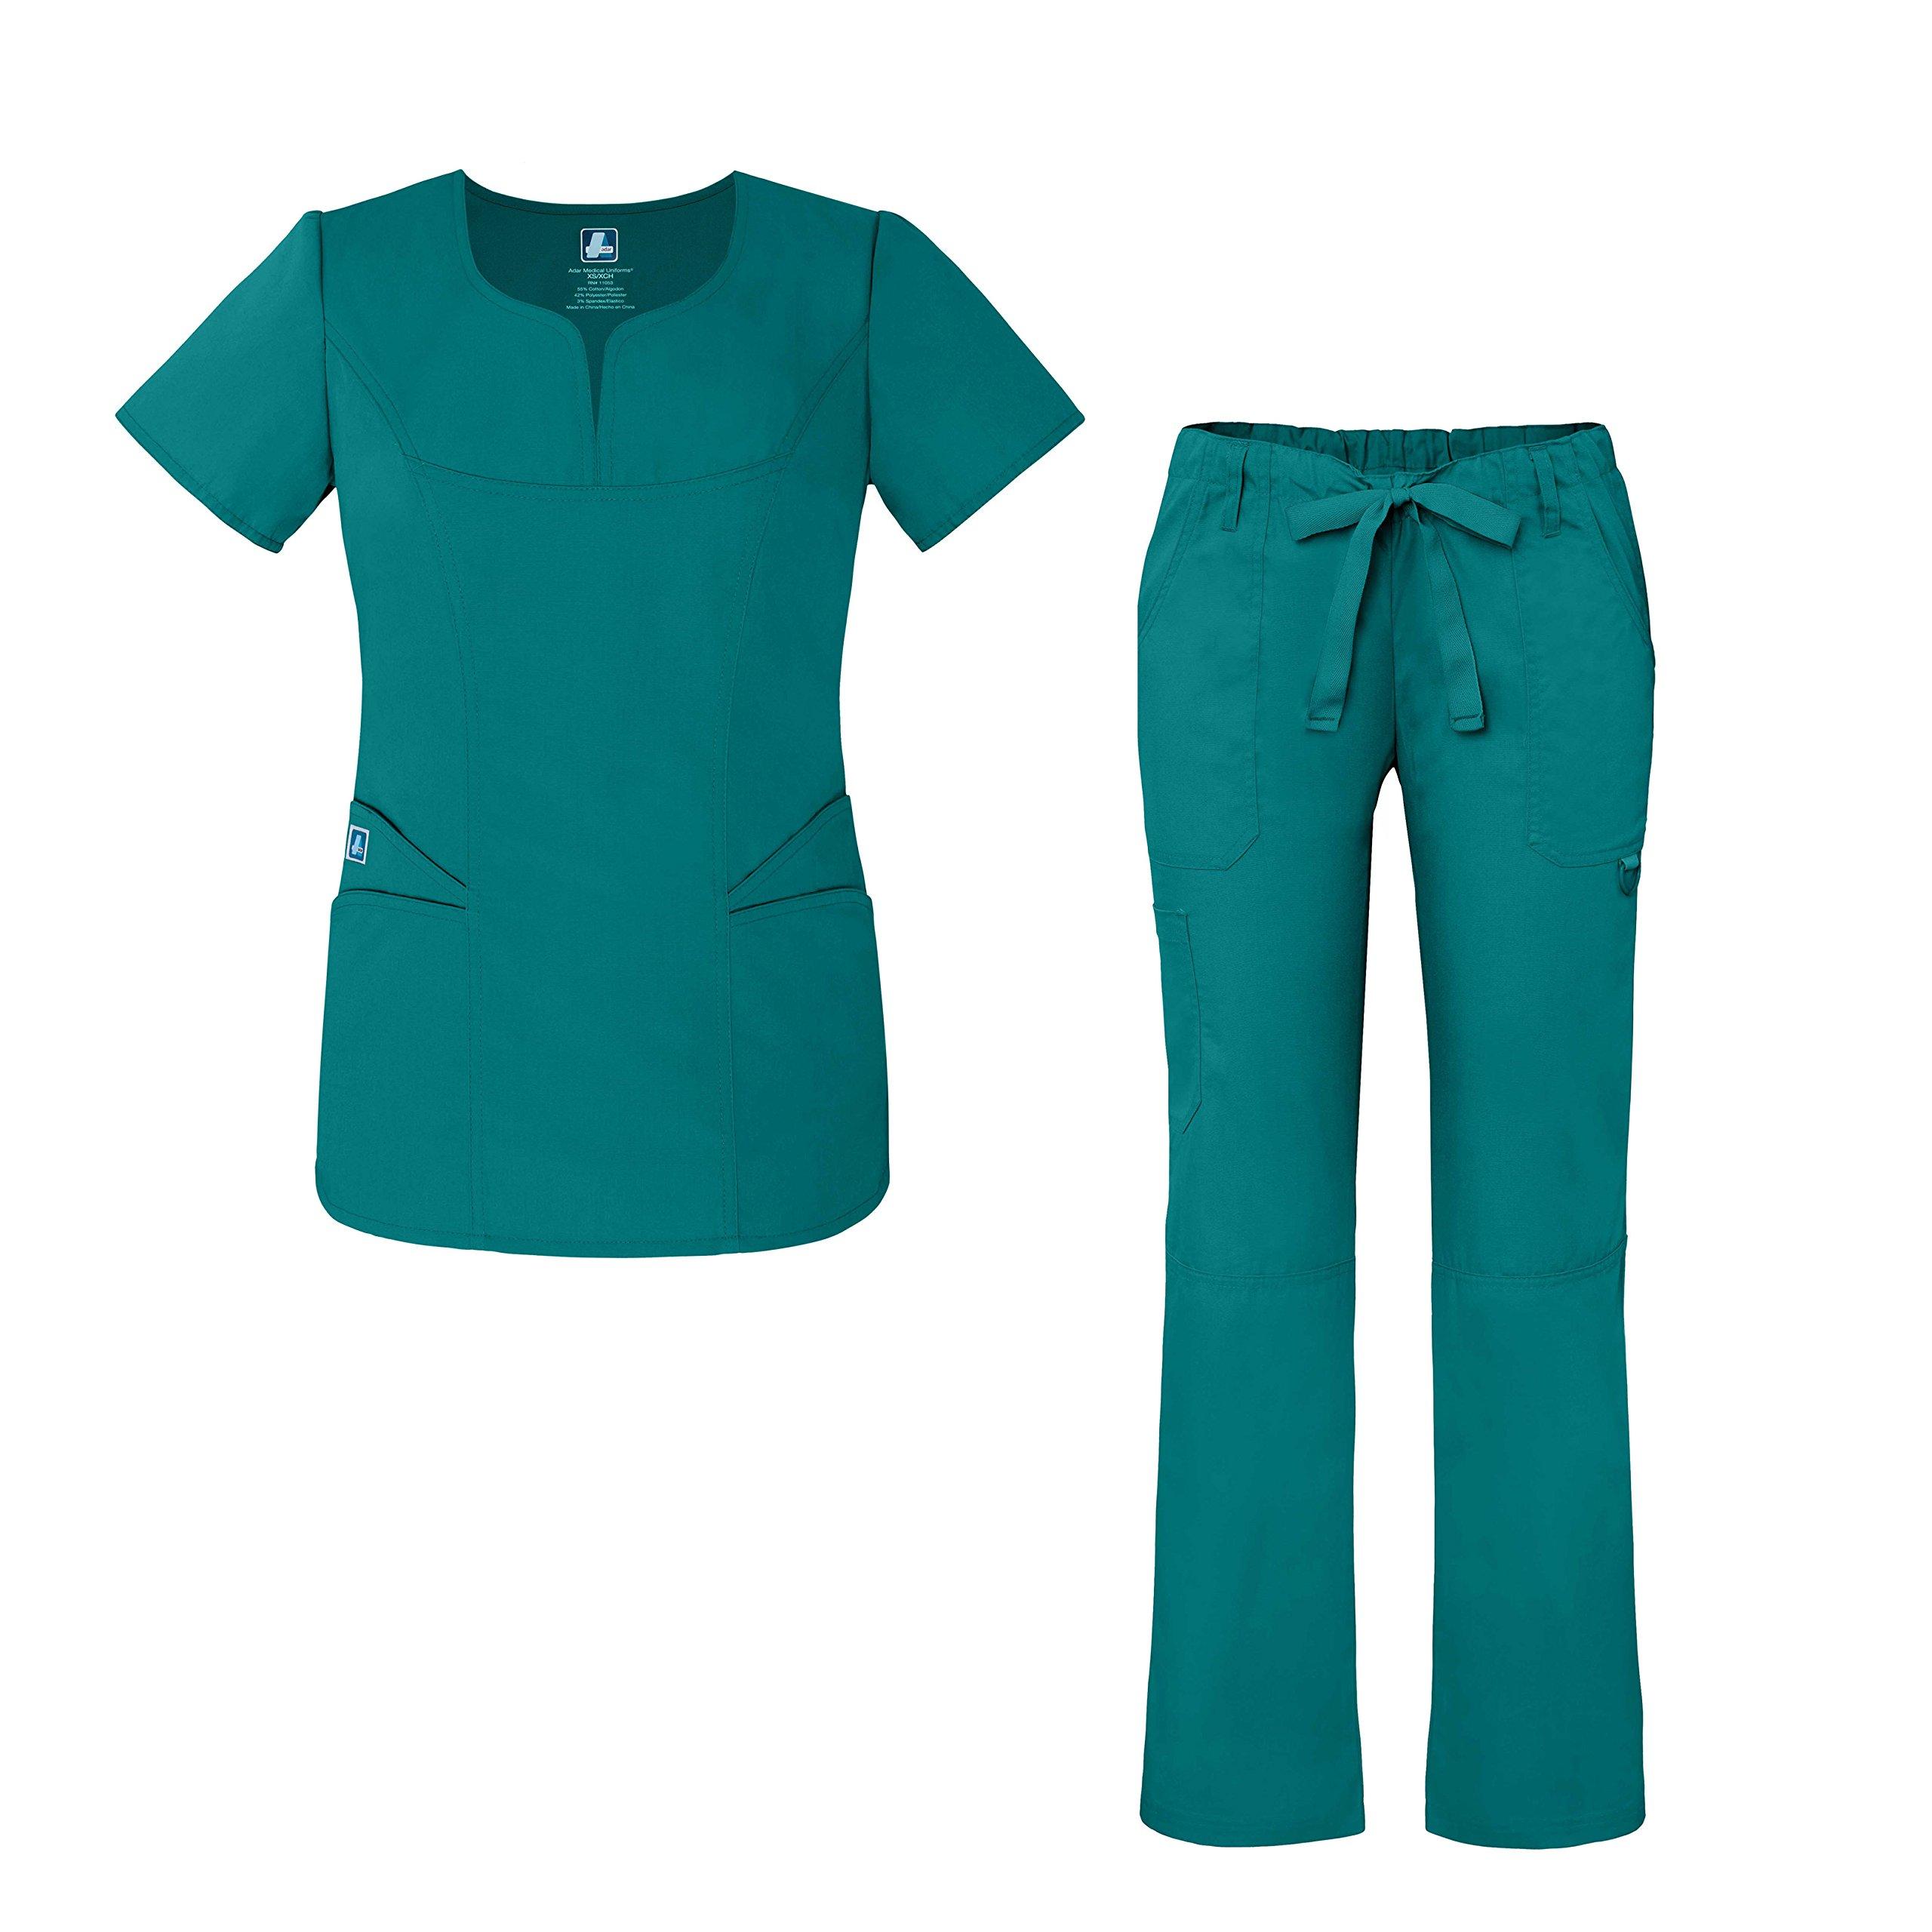 7651327f60e Adar Universal Women's Scrub Set - Fashion Scrub Top and Multi-Pocket Scrub  Pants - 903 - Teal Blue - 4X